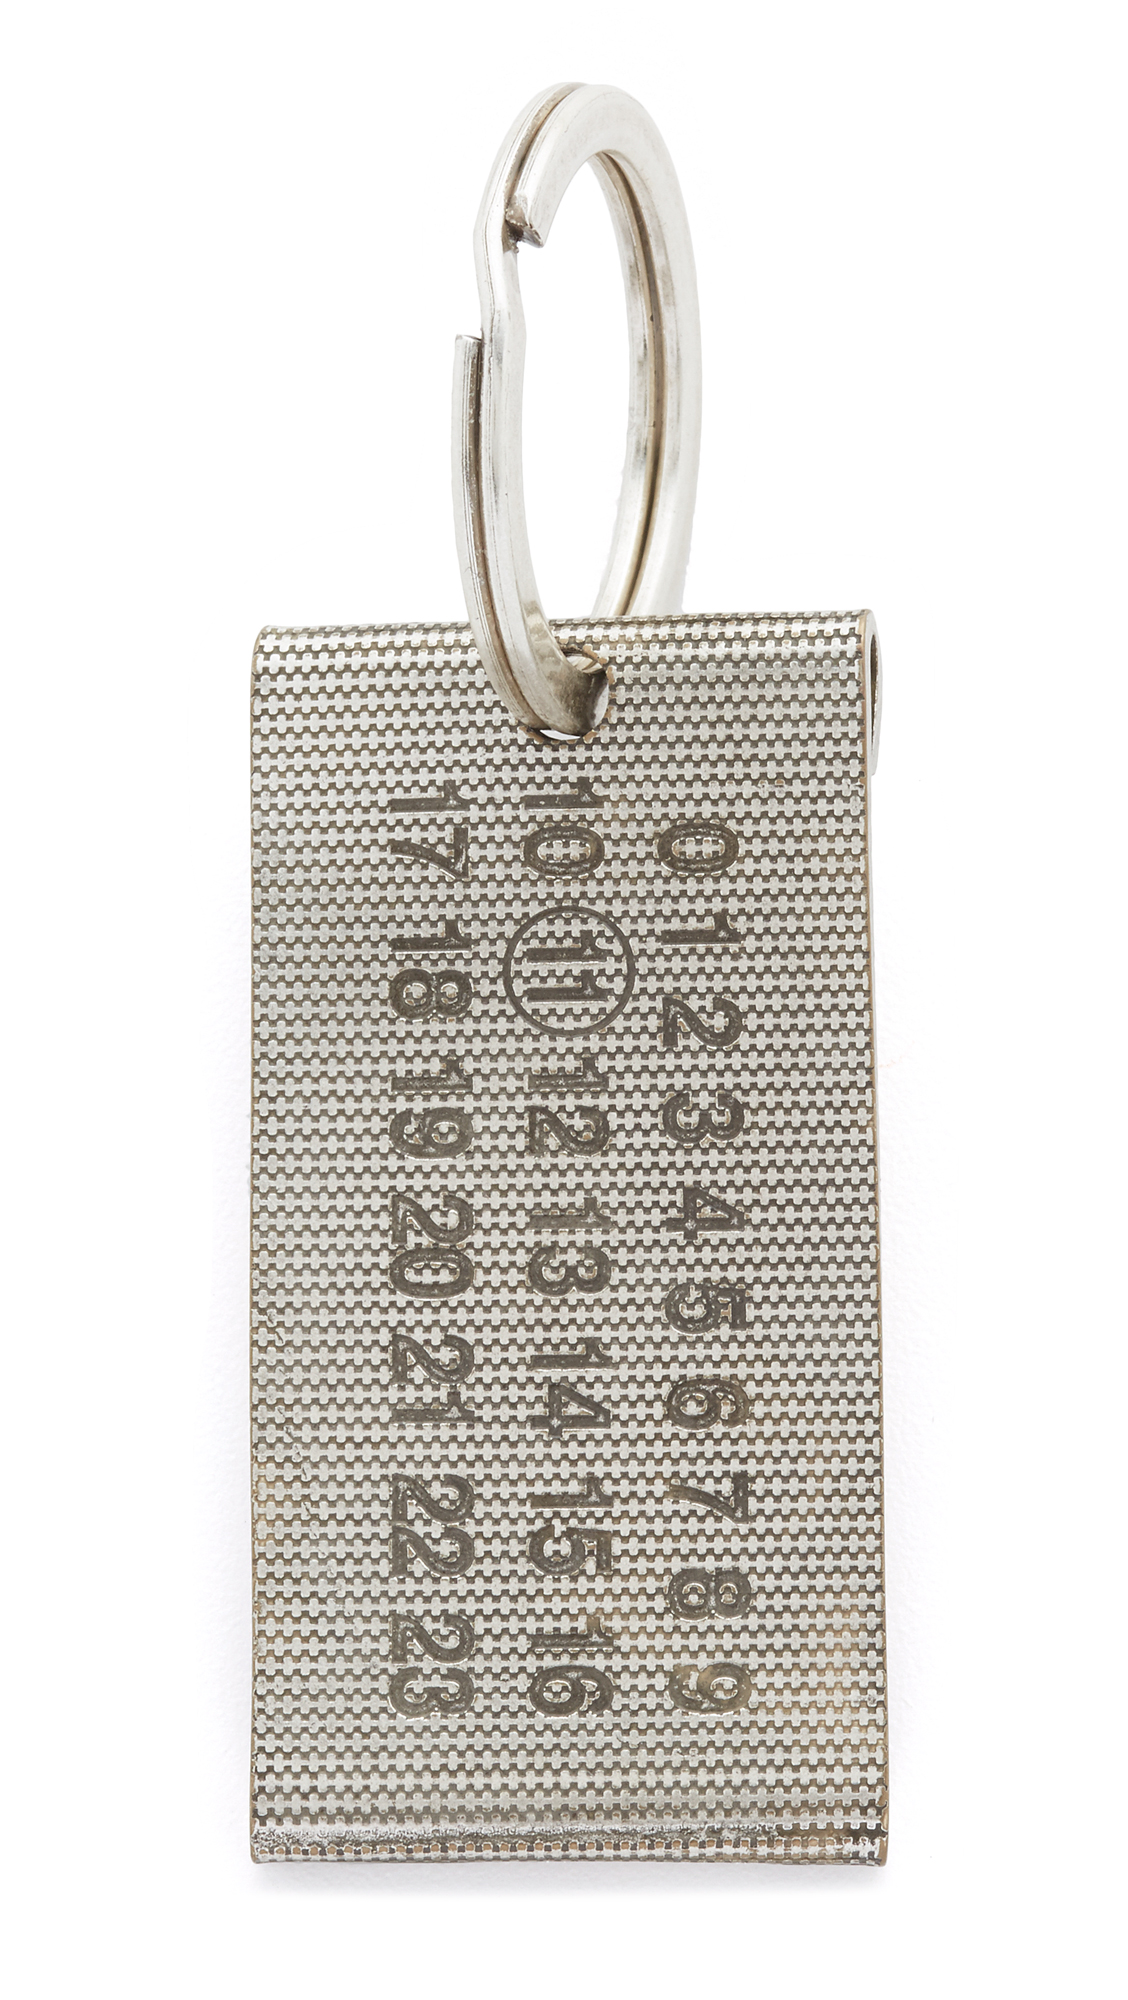 Maison Margiela Margiela Keychain - Silver